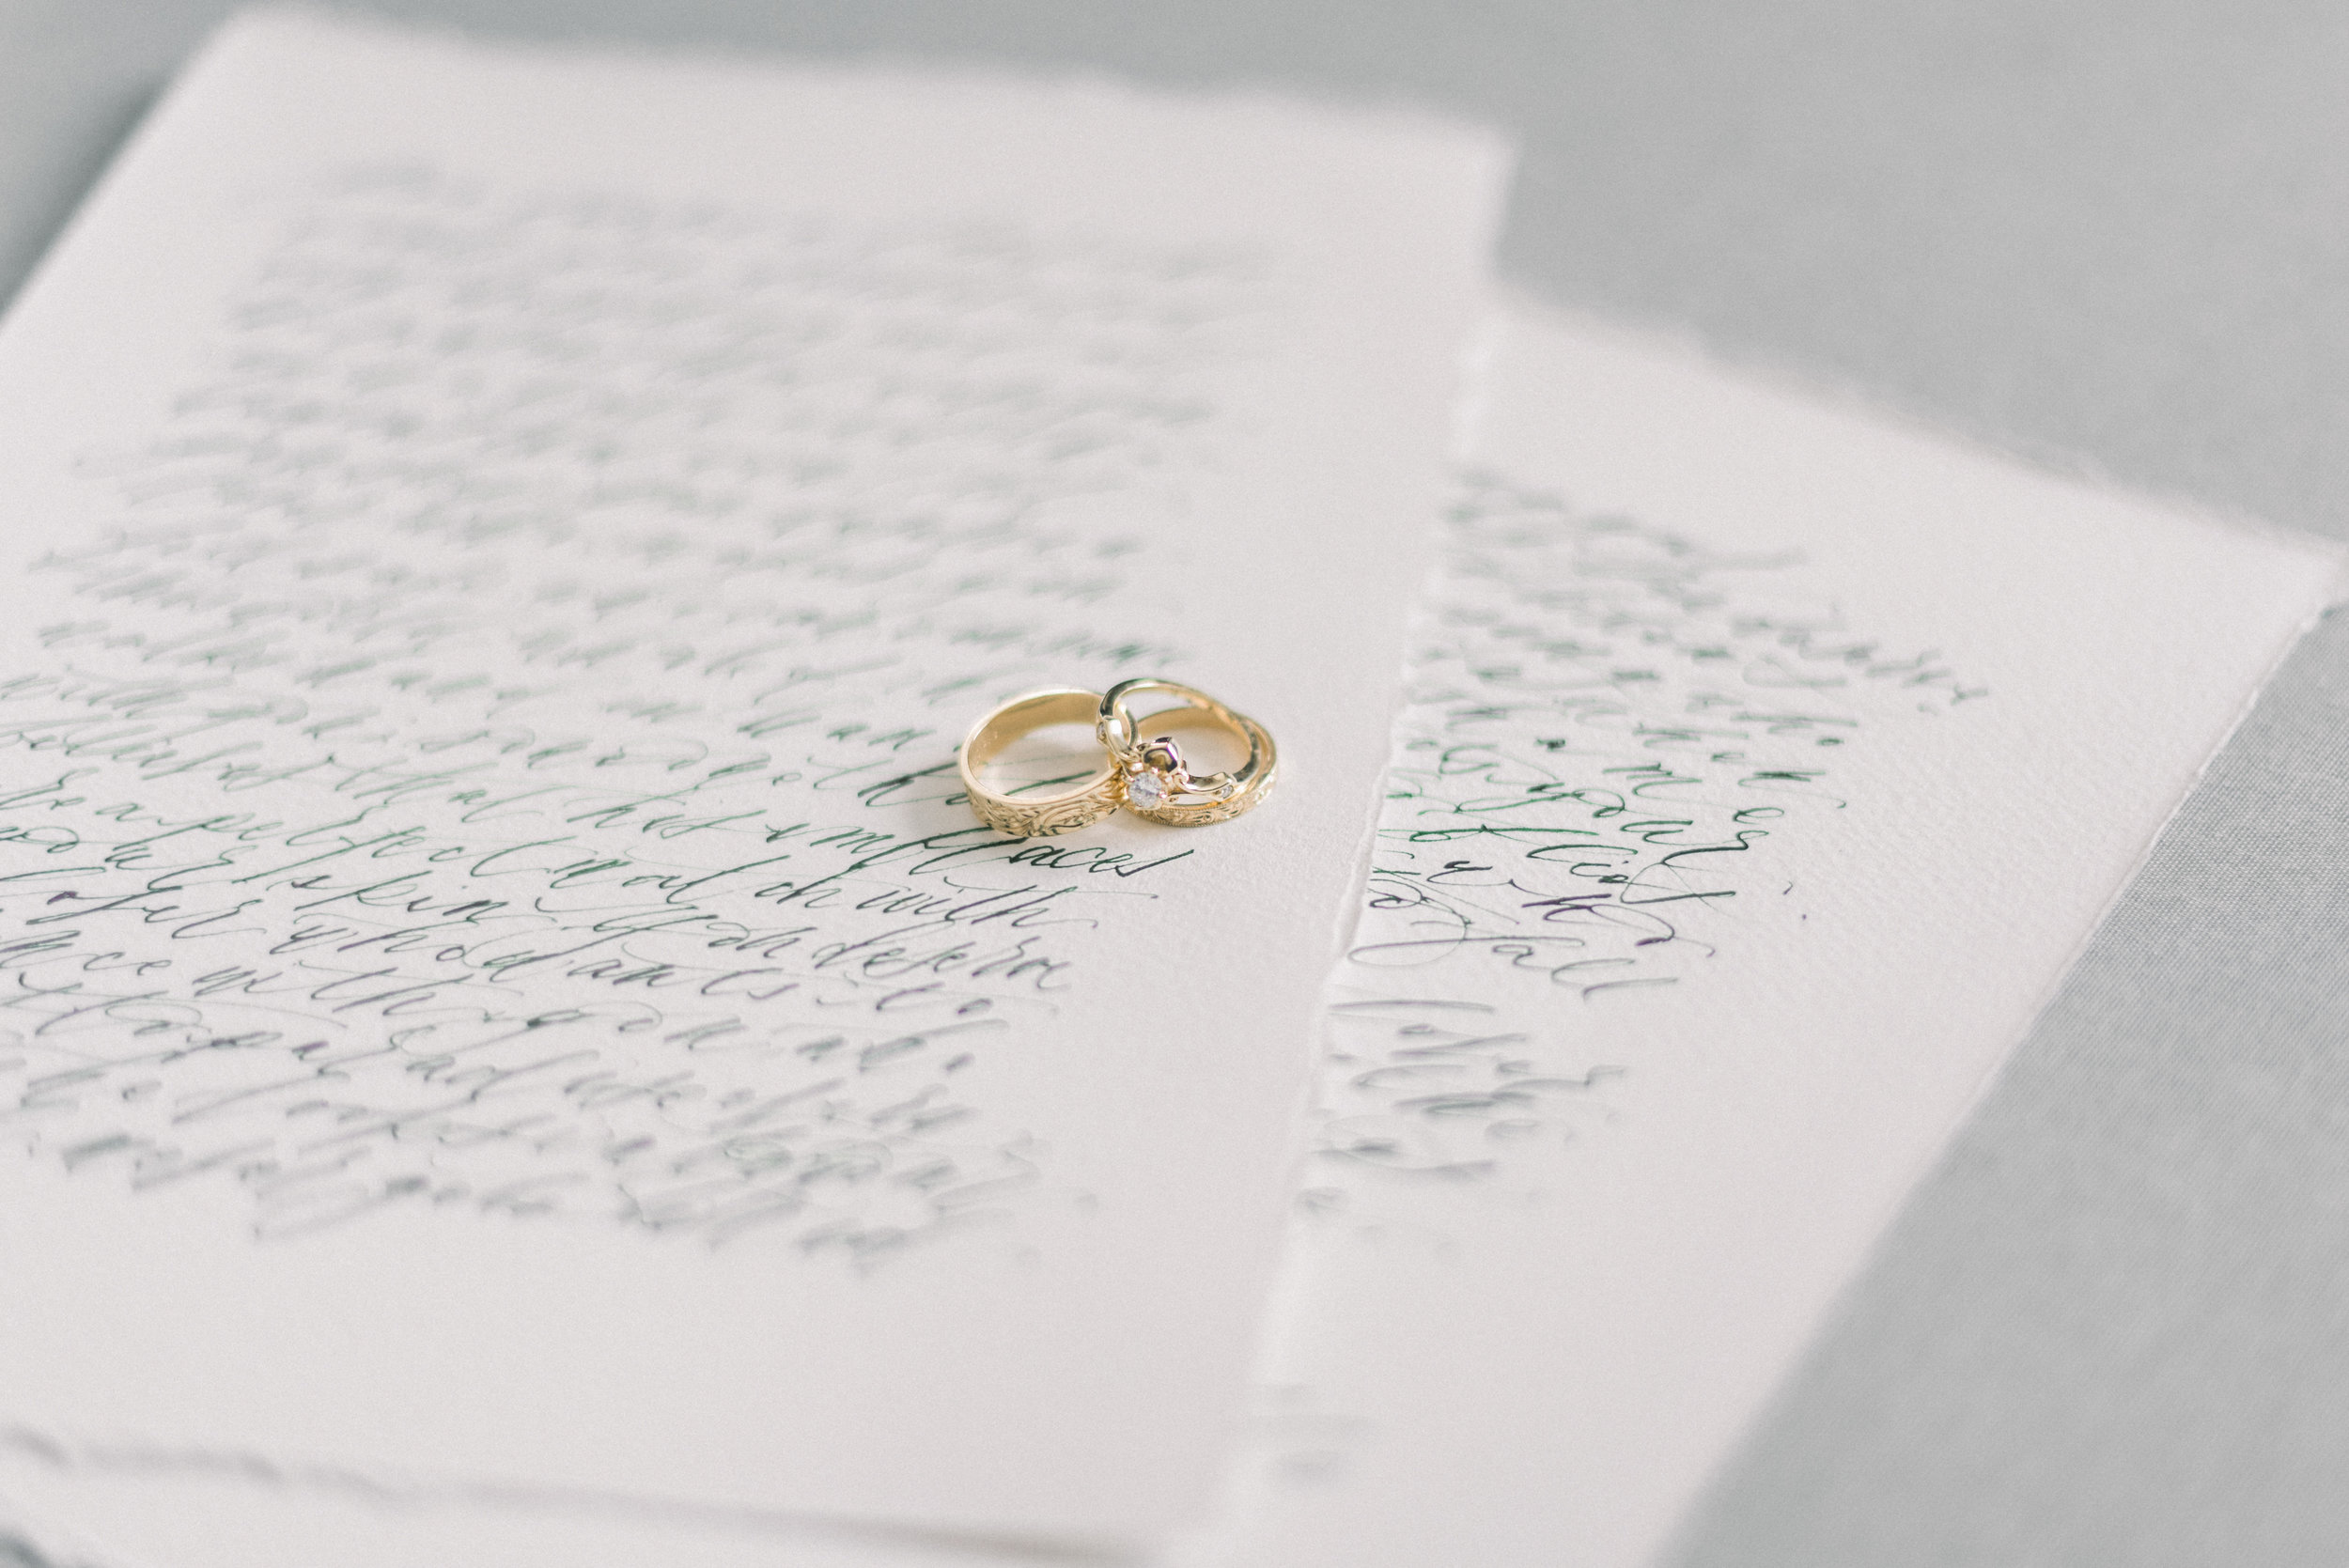 Details- Rings